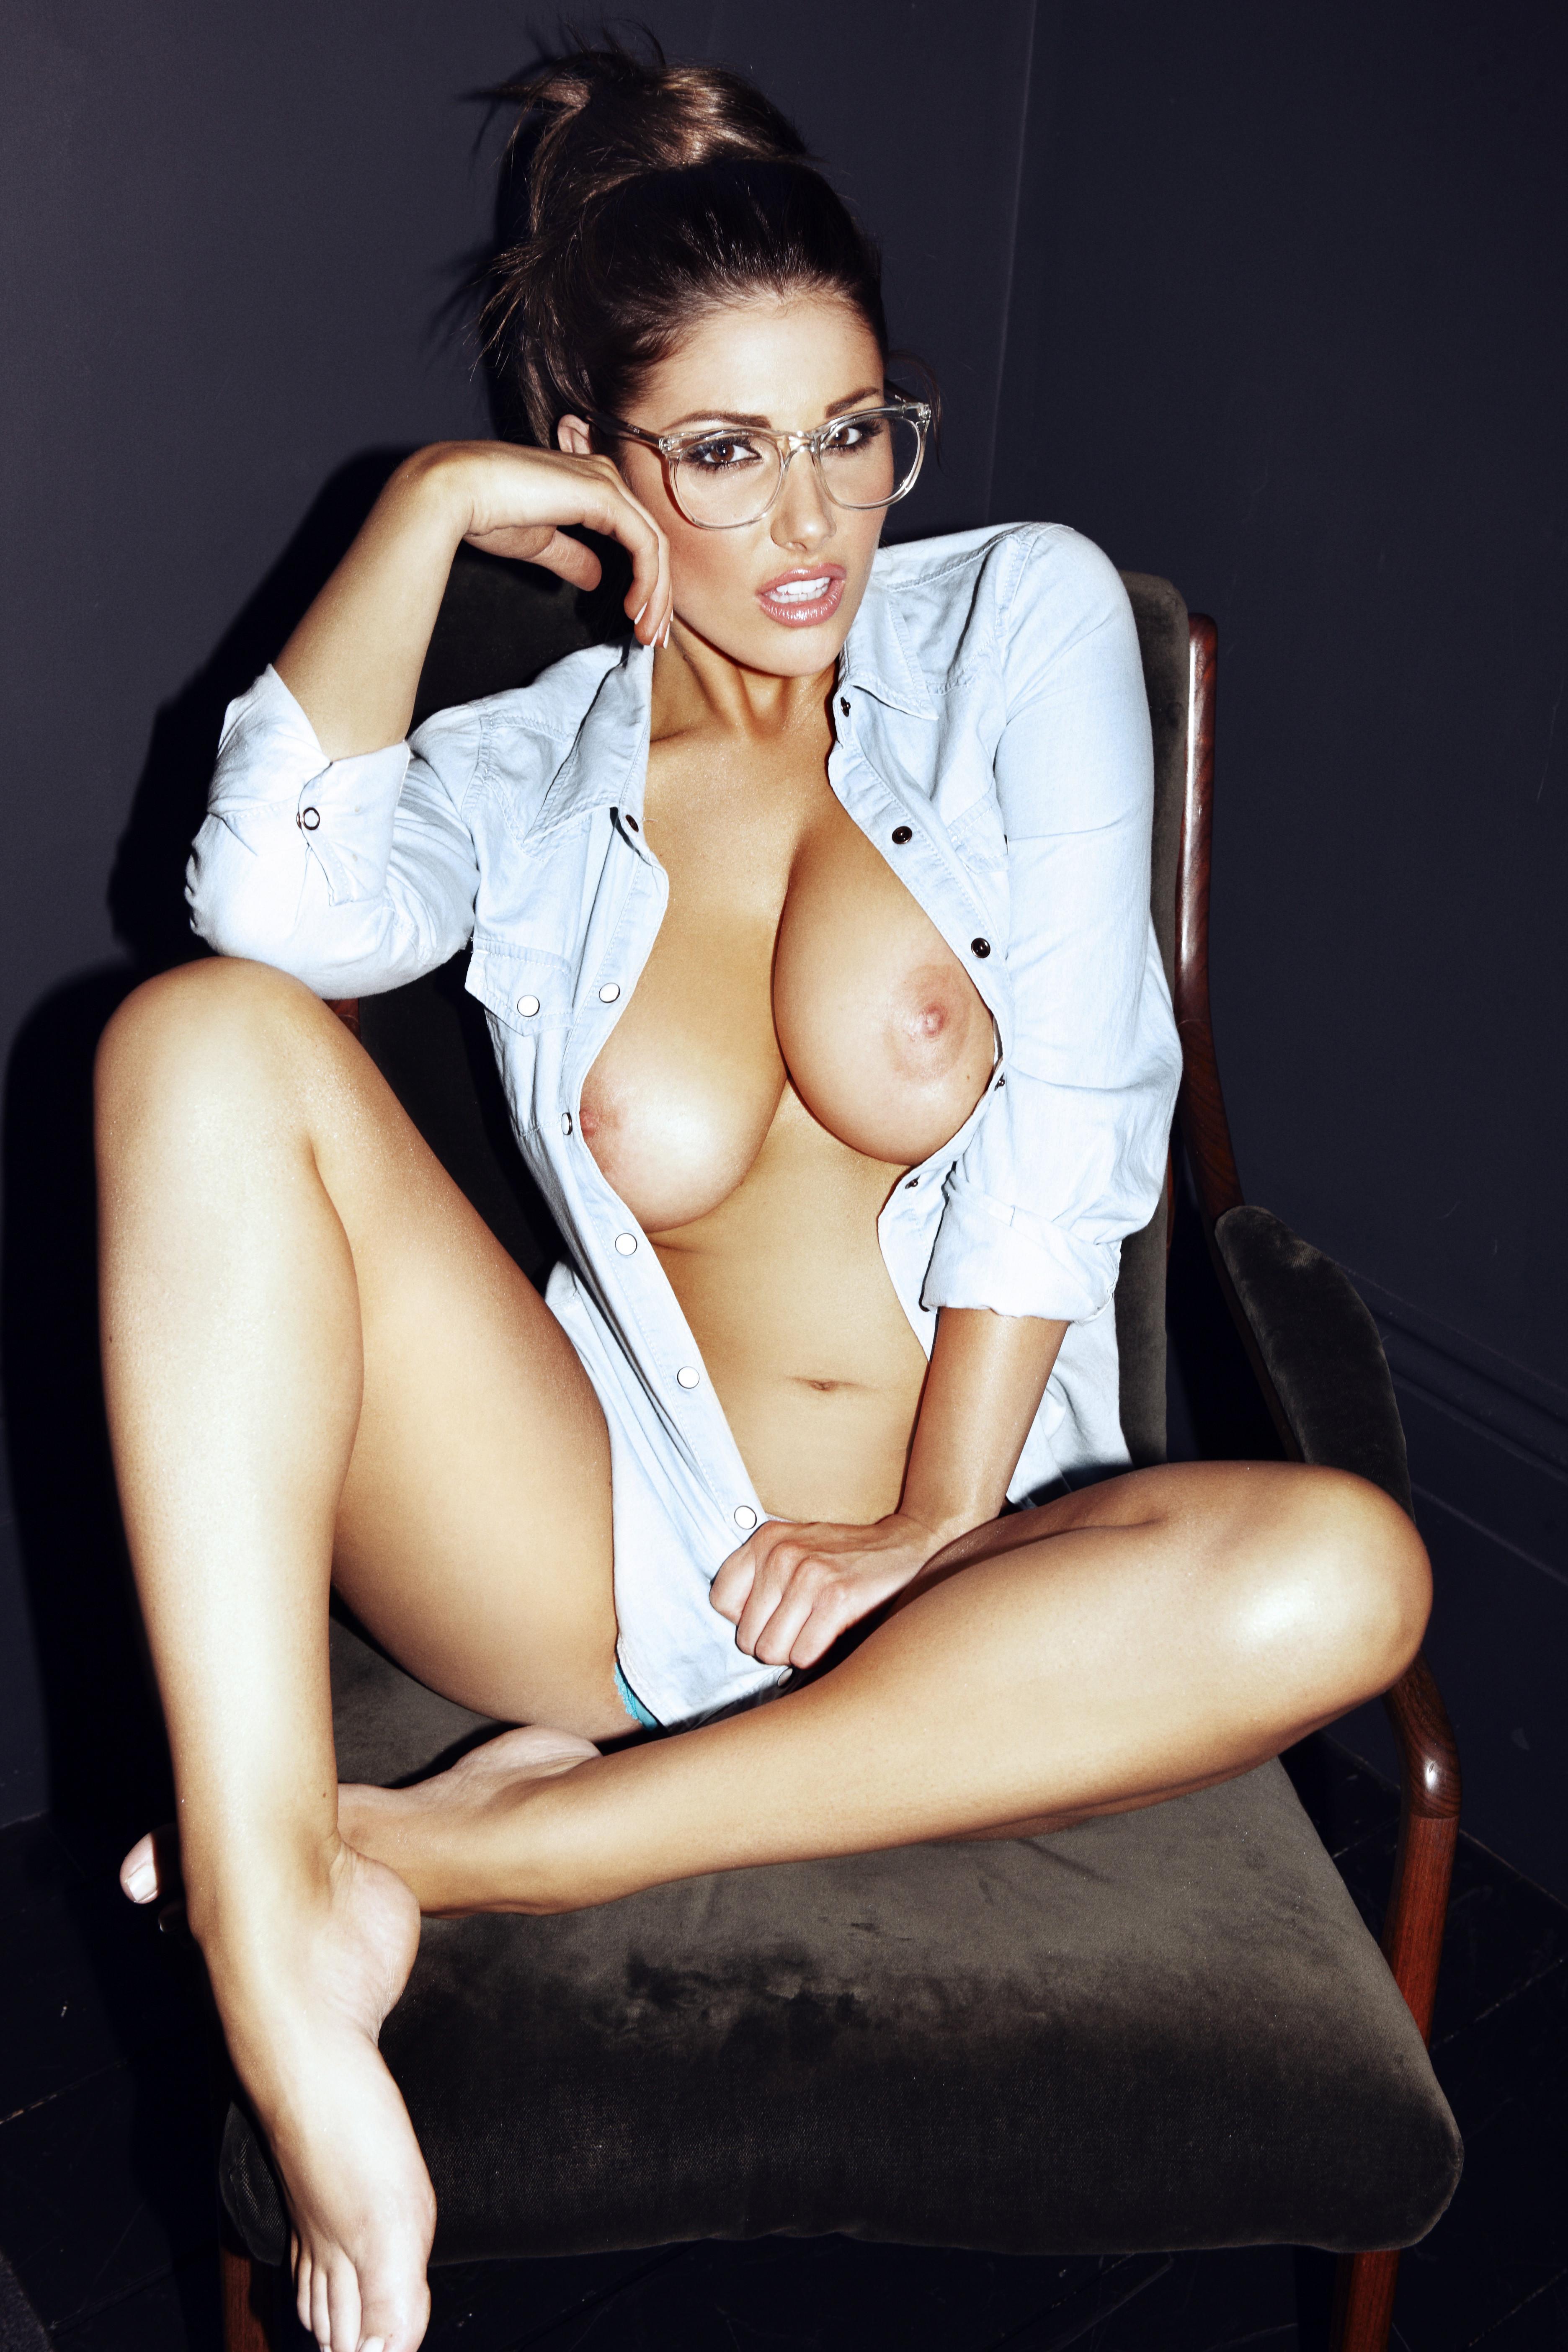 huge-boobs-tits-naked-mix-vol5-24